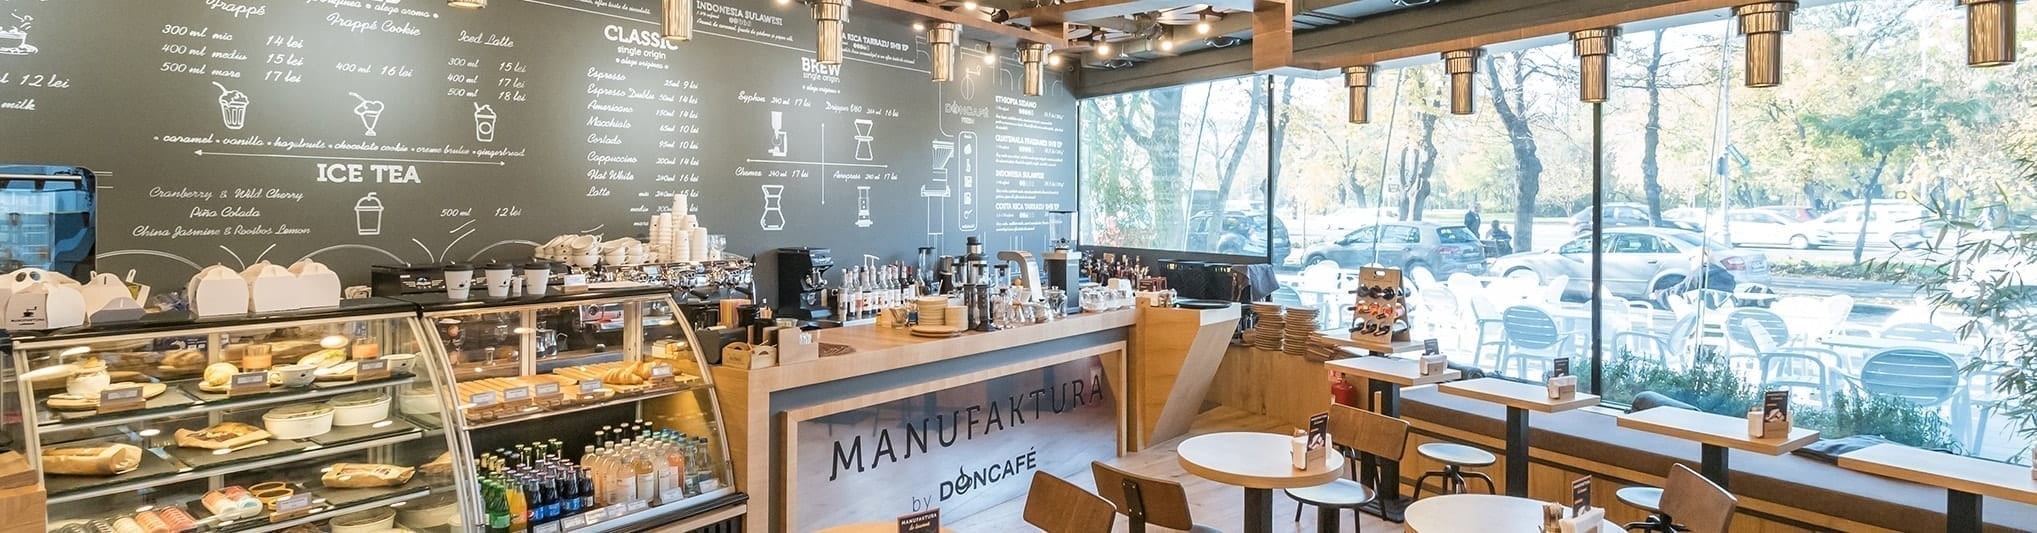 Manufaktura The Coffee Shop Restaurant